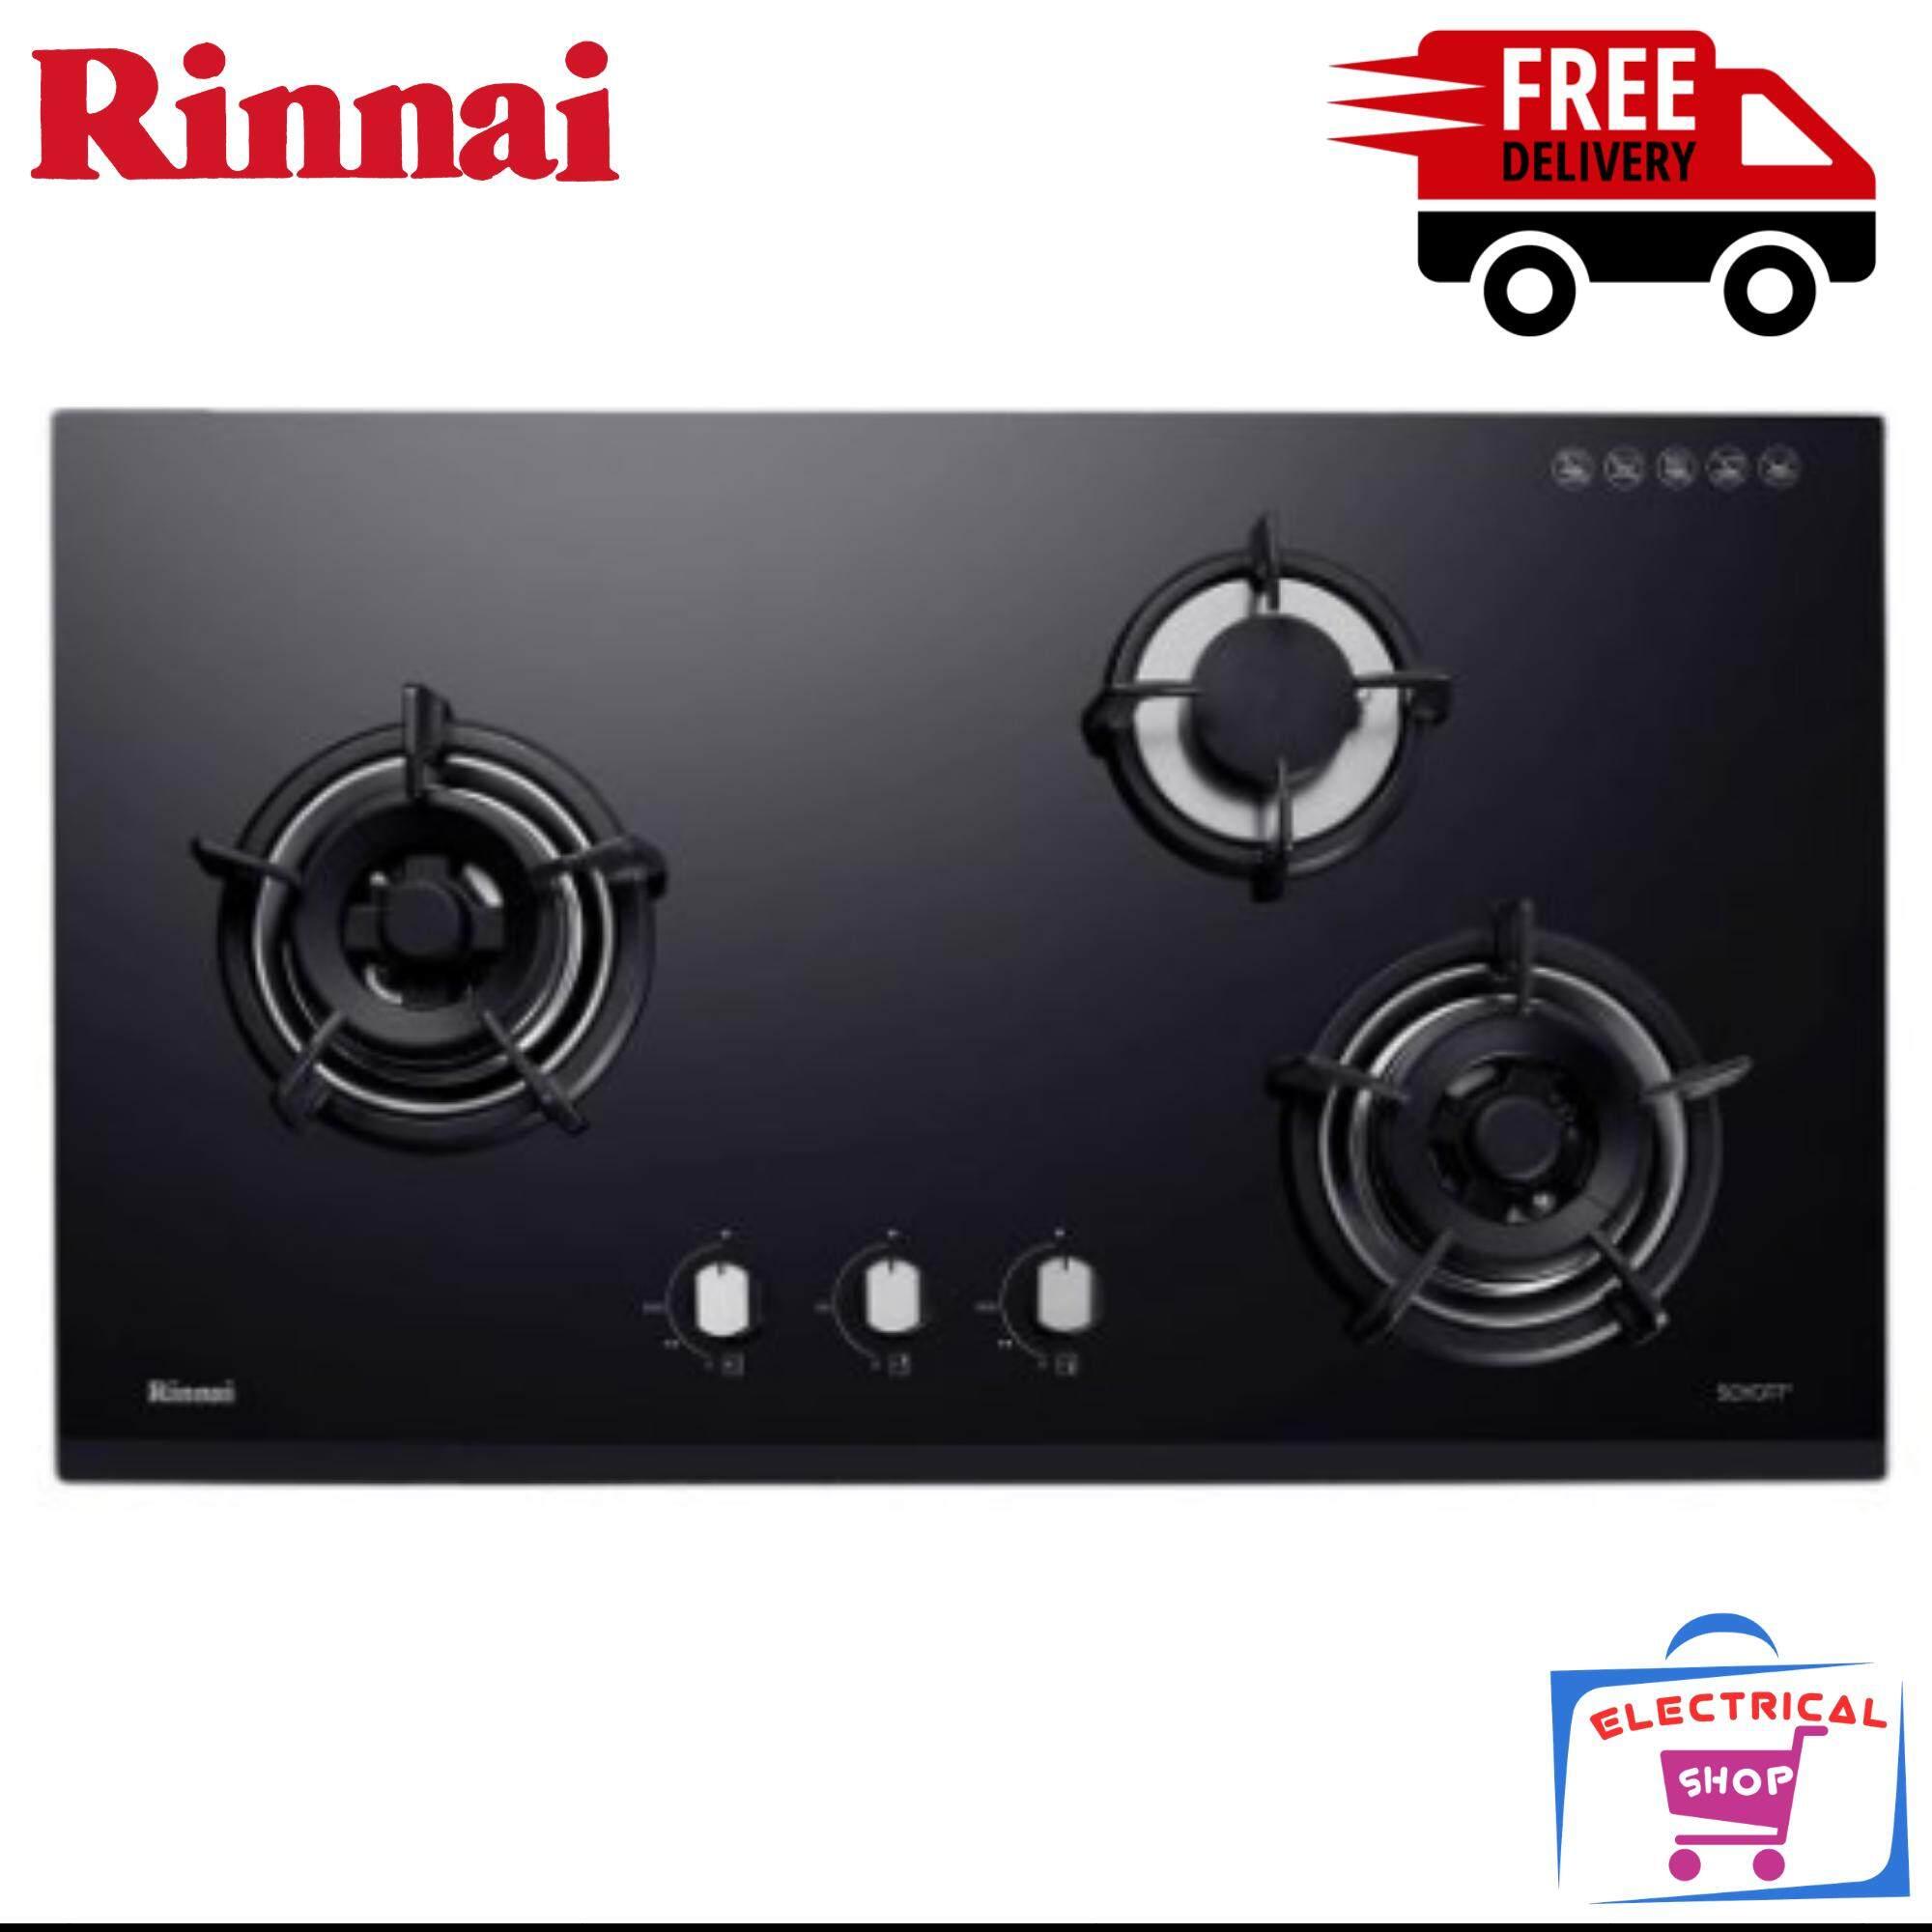 Rinnai Gas Hob Rb93ug 3 Hyper Burner 5 5kw Flexible Cut Out Free